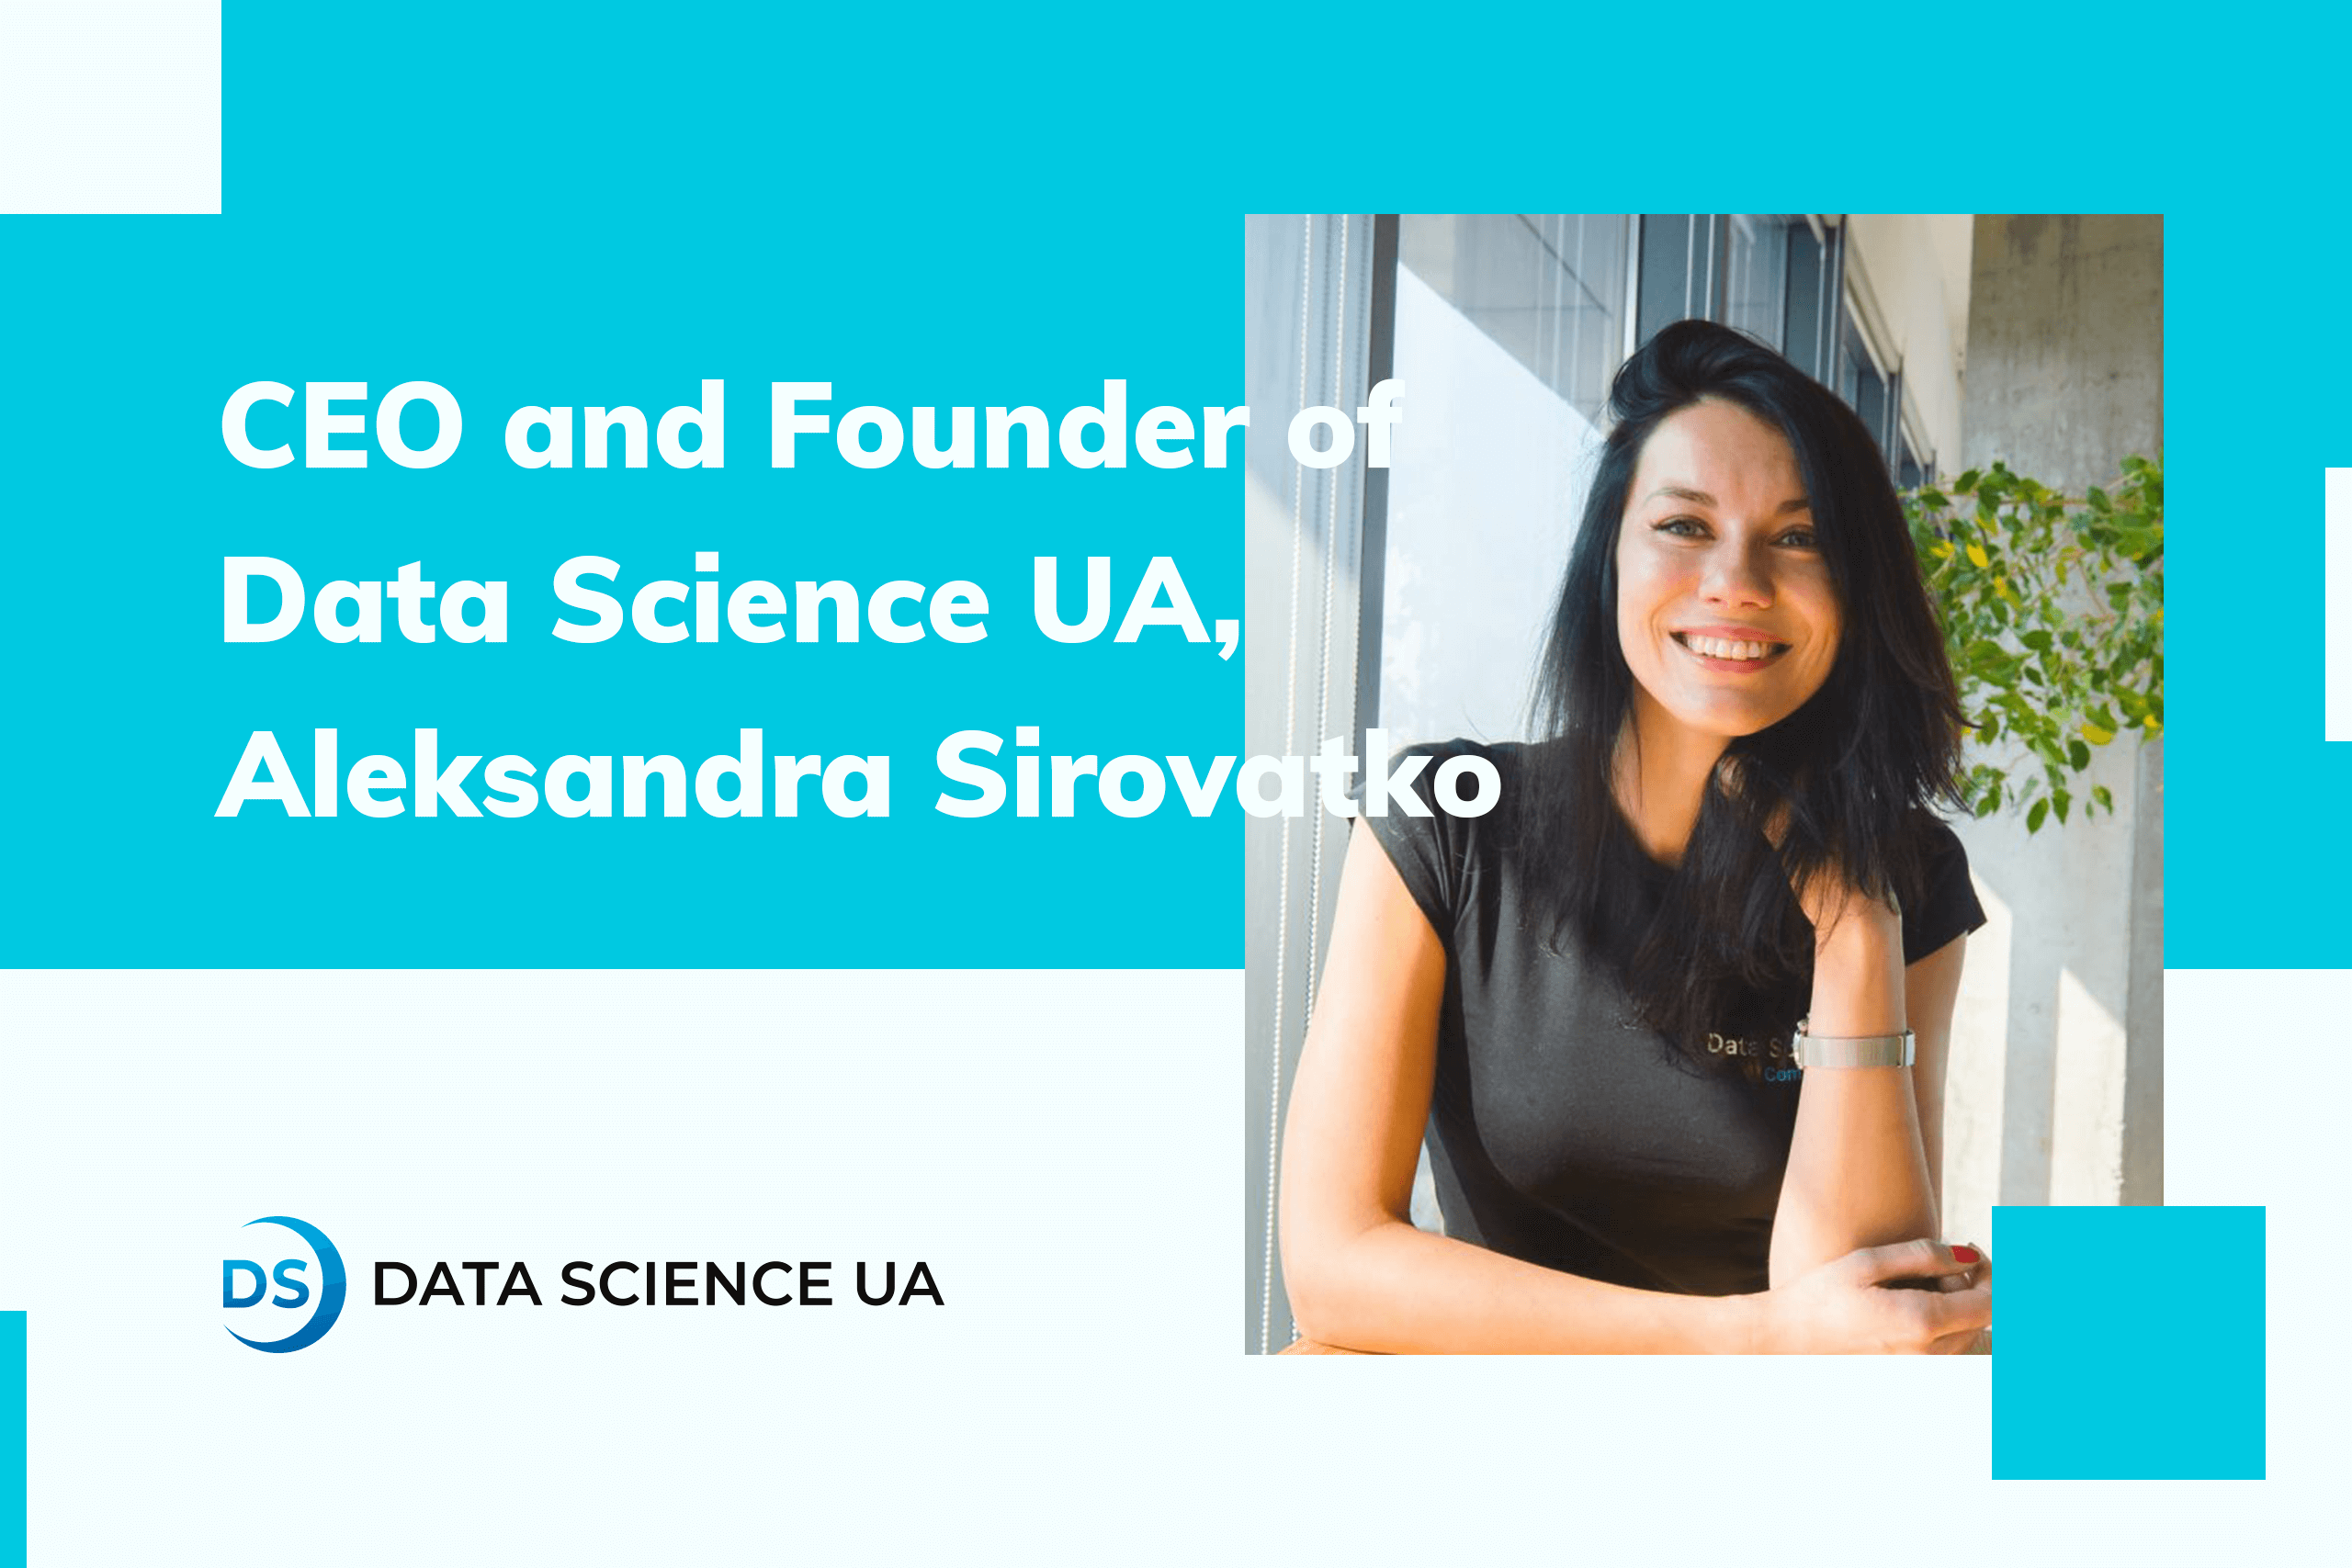 CEO and Founder of Data Science UA, Aleksandra Sirovatko